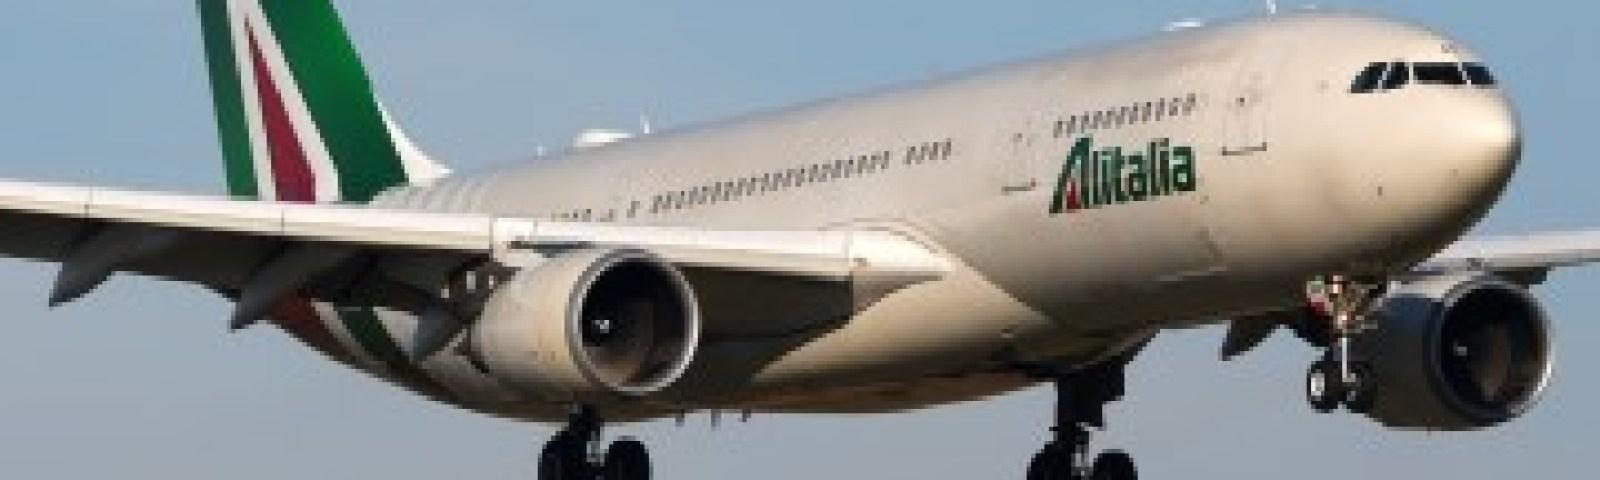 Aigle Azur – все о втором по величине авиаперевозчике Франции